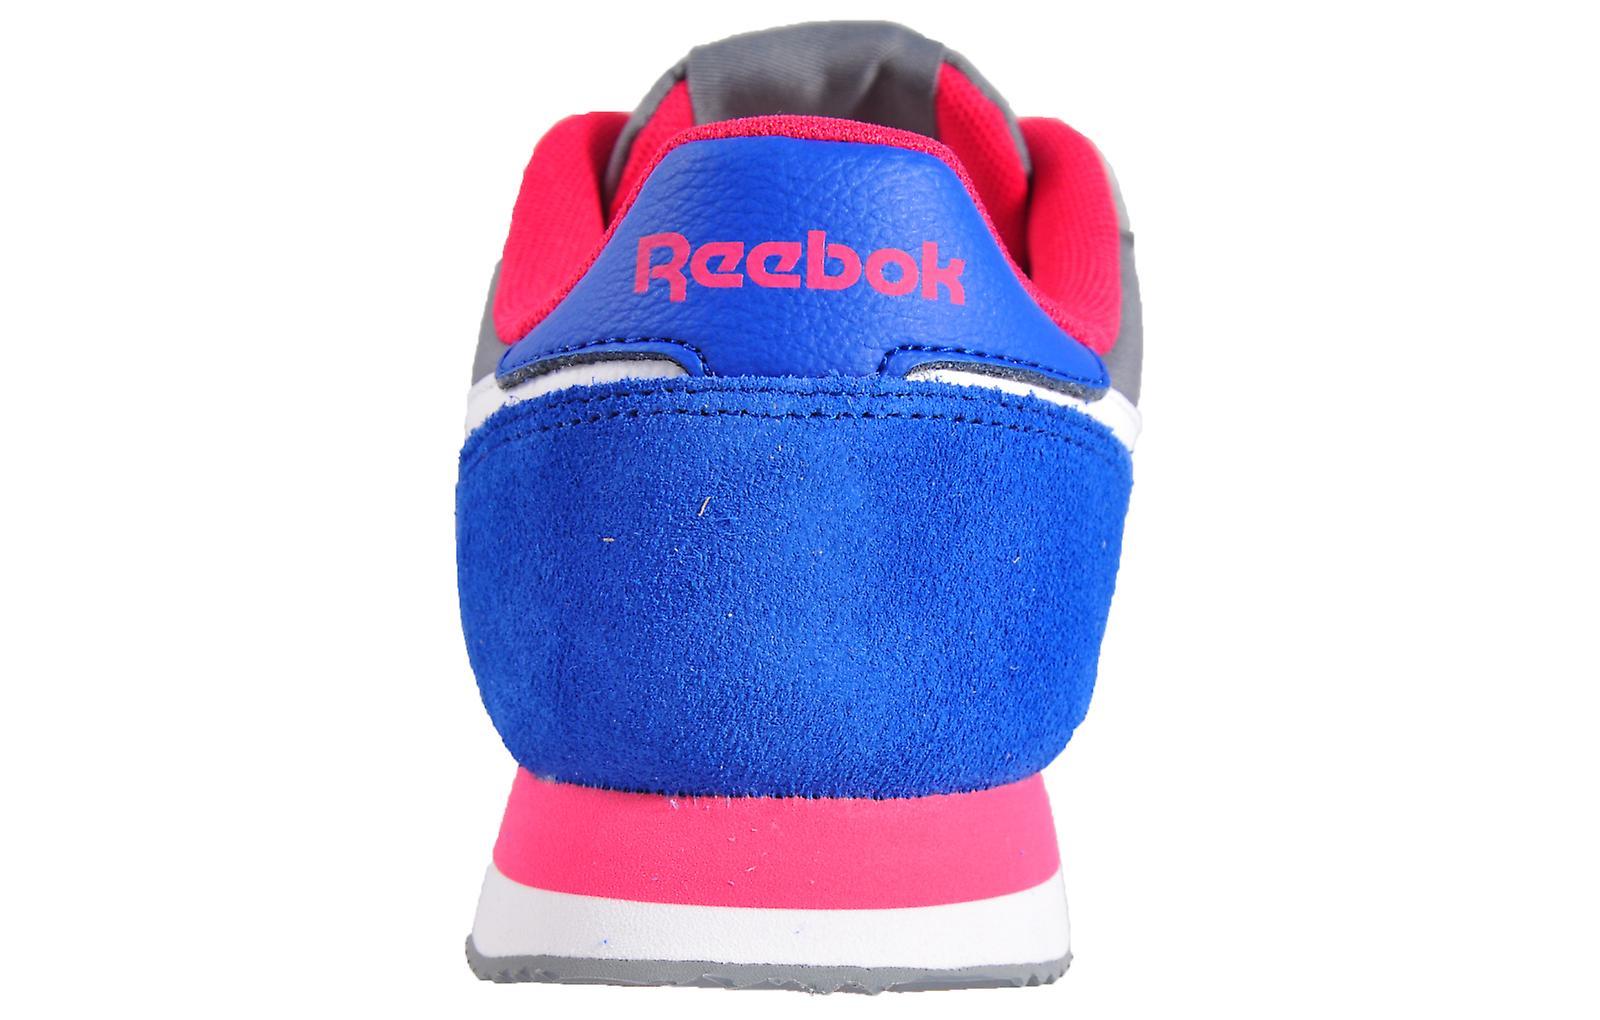 Reebok Royal CL Jogger Aste Dust / Blue / Pink / White